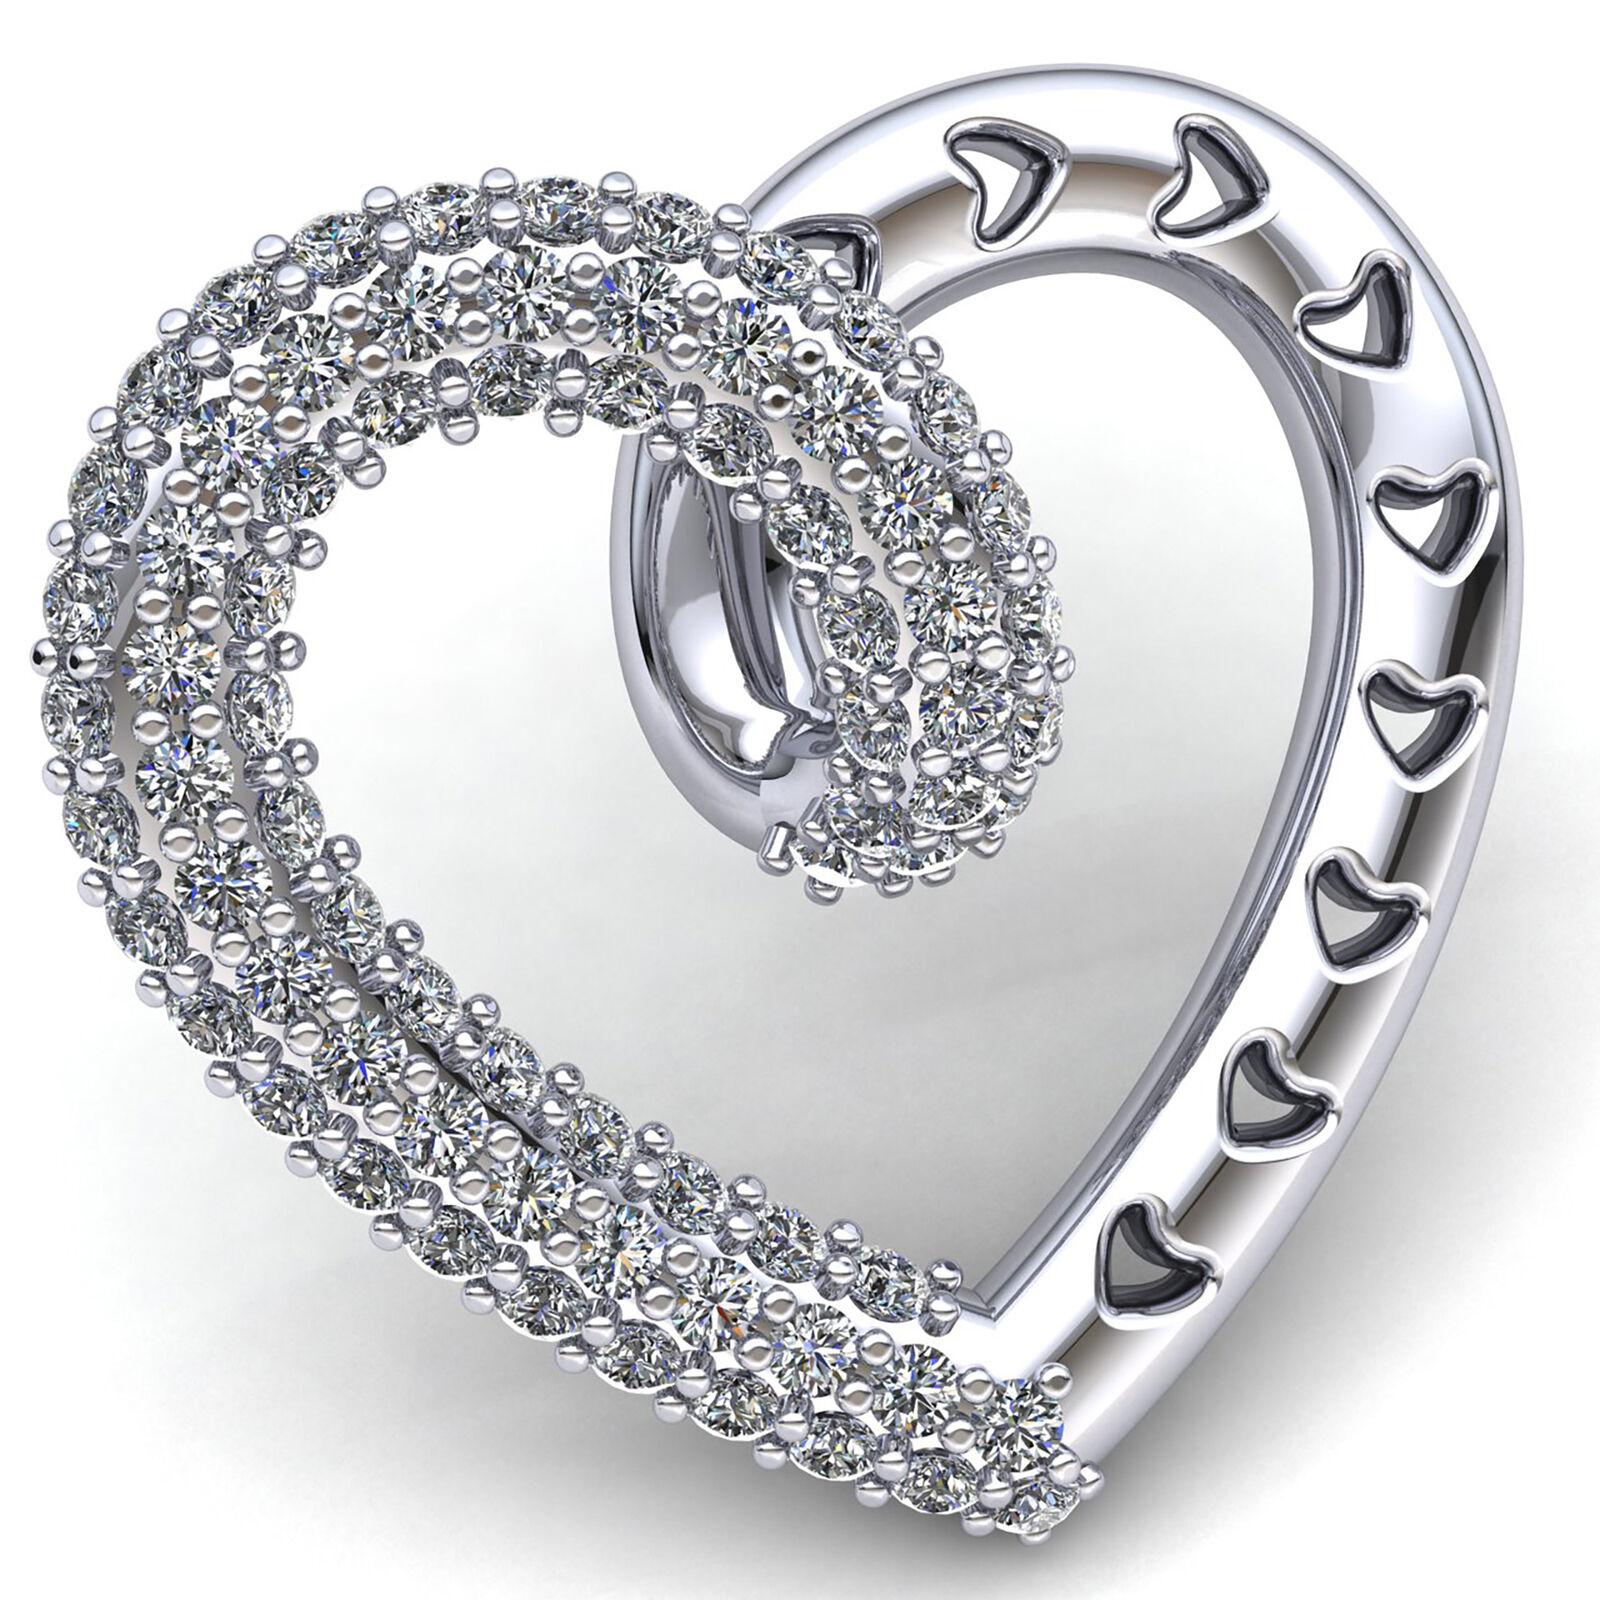 Genuine 1.0carat Round Cut Diamond Women's Valentine Heart Pendant 14K gold